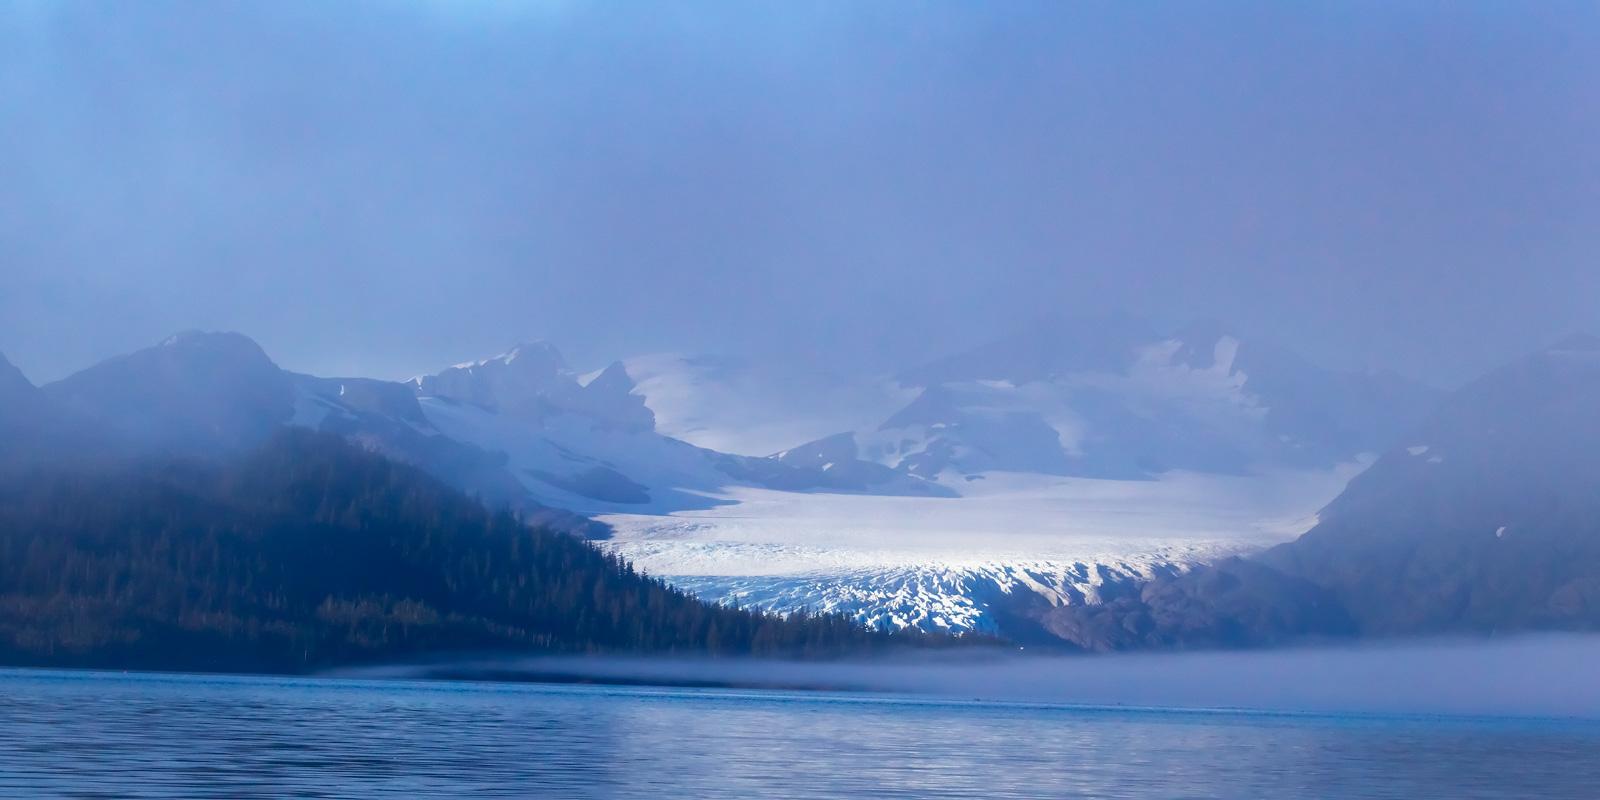 Alaska, Glacier, Prince William Sound, photo